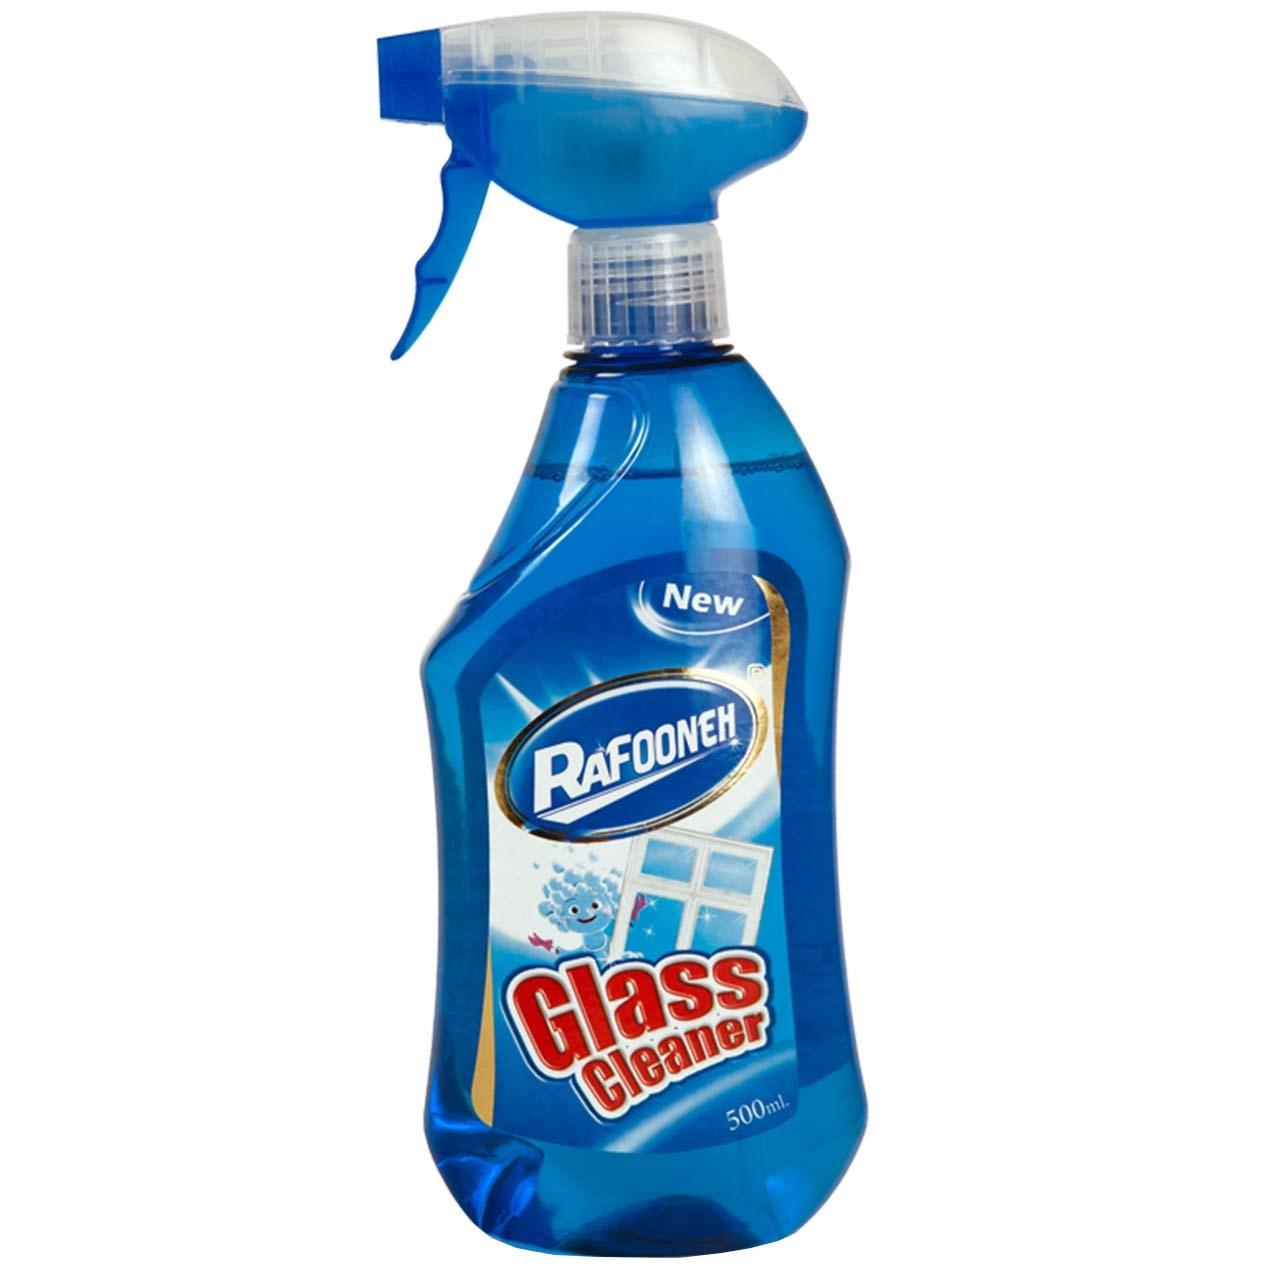 شیشه پاک کن آبی رافونه حجم 500 میلی لیتر